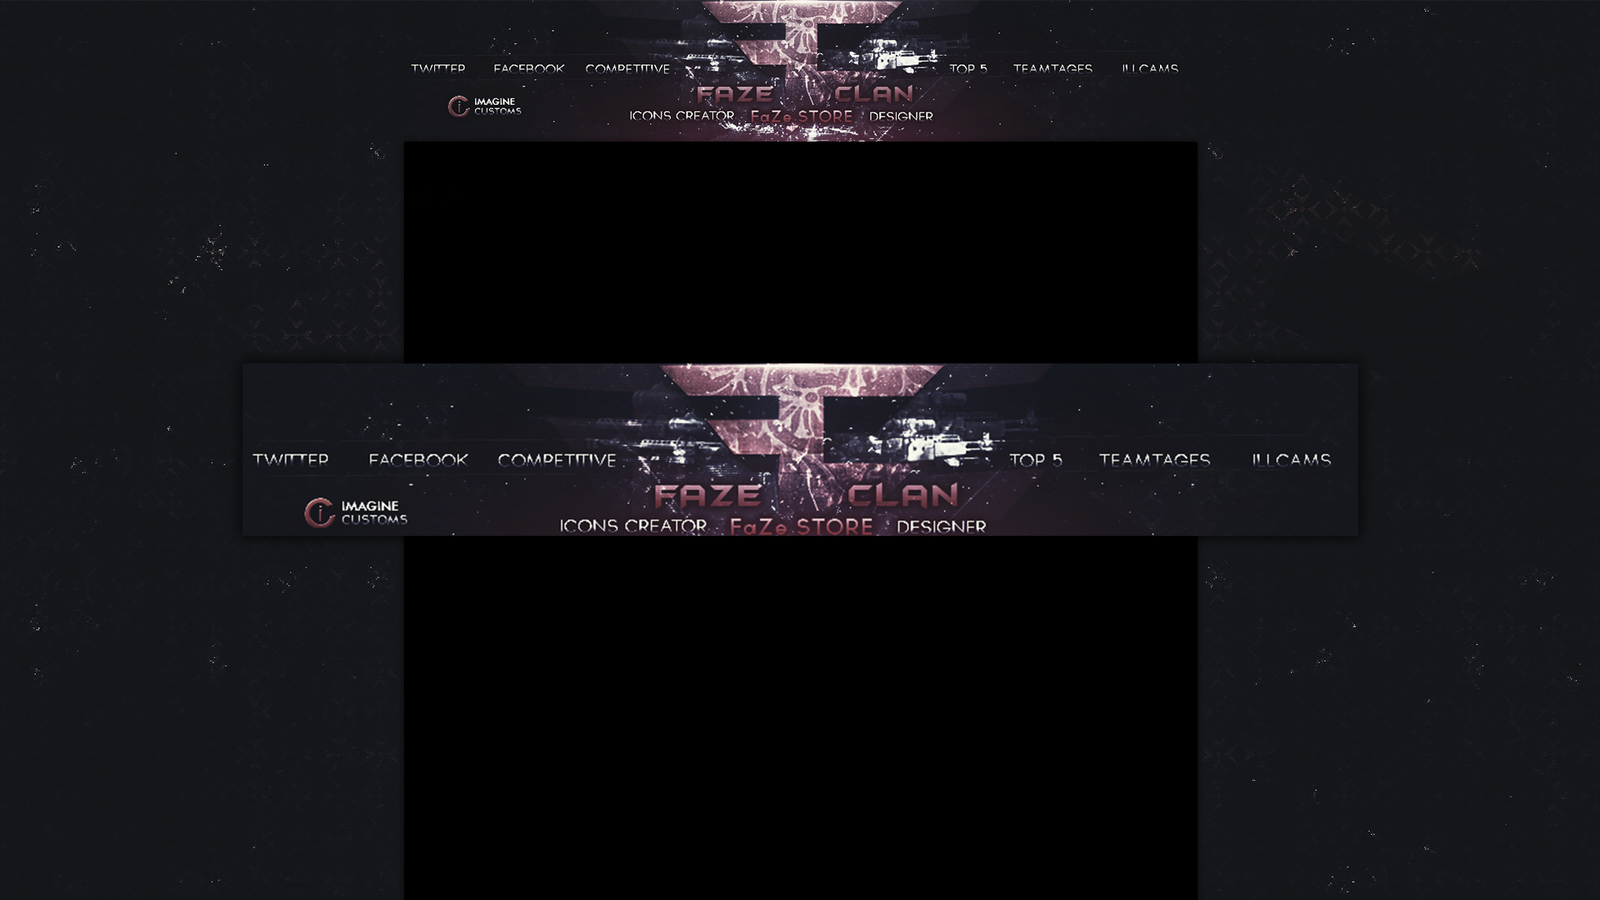 Faze Clan Wallpaper Faze clan youtube background 1600x900